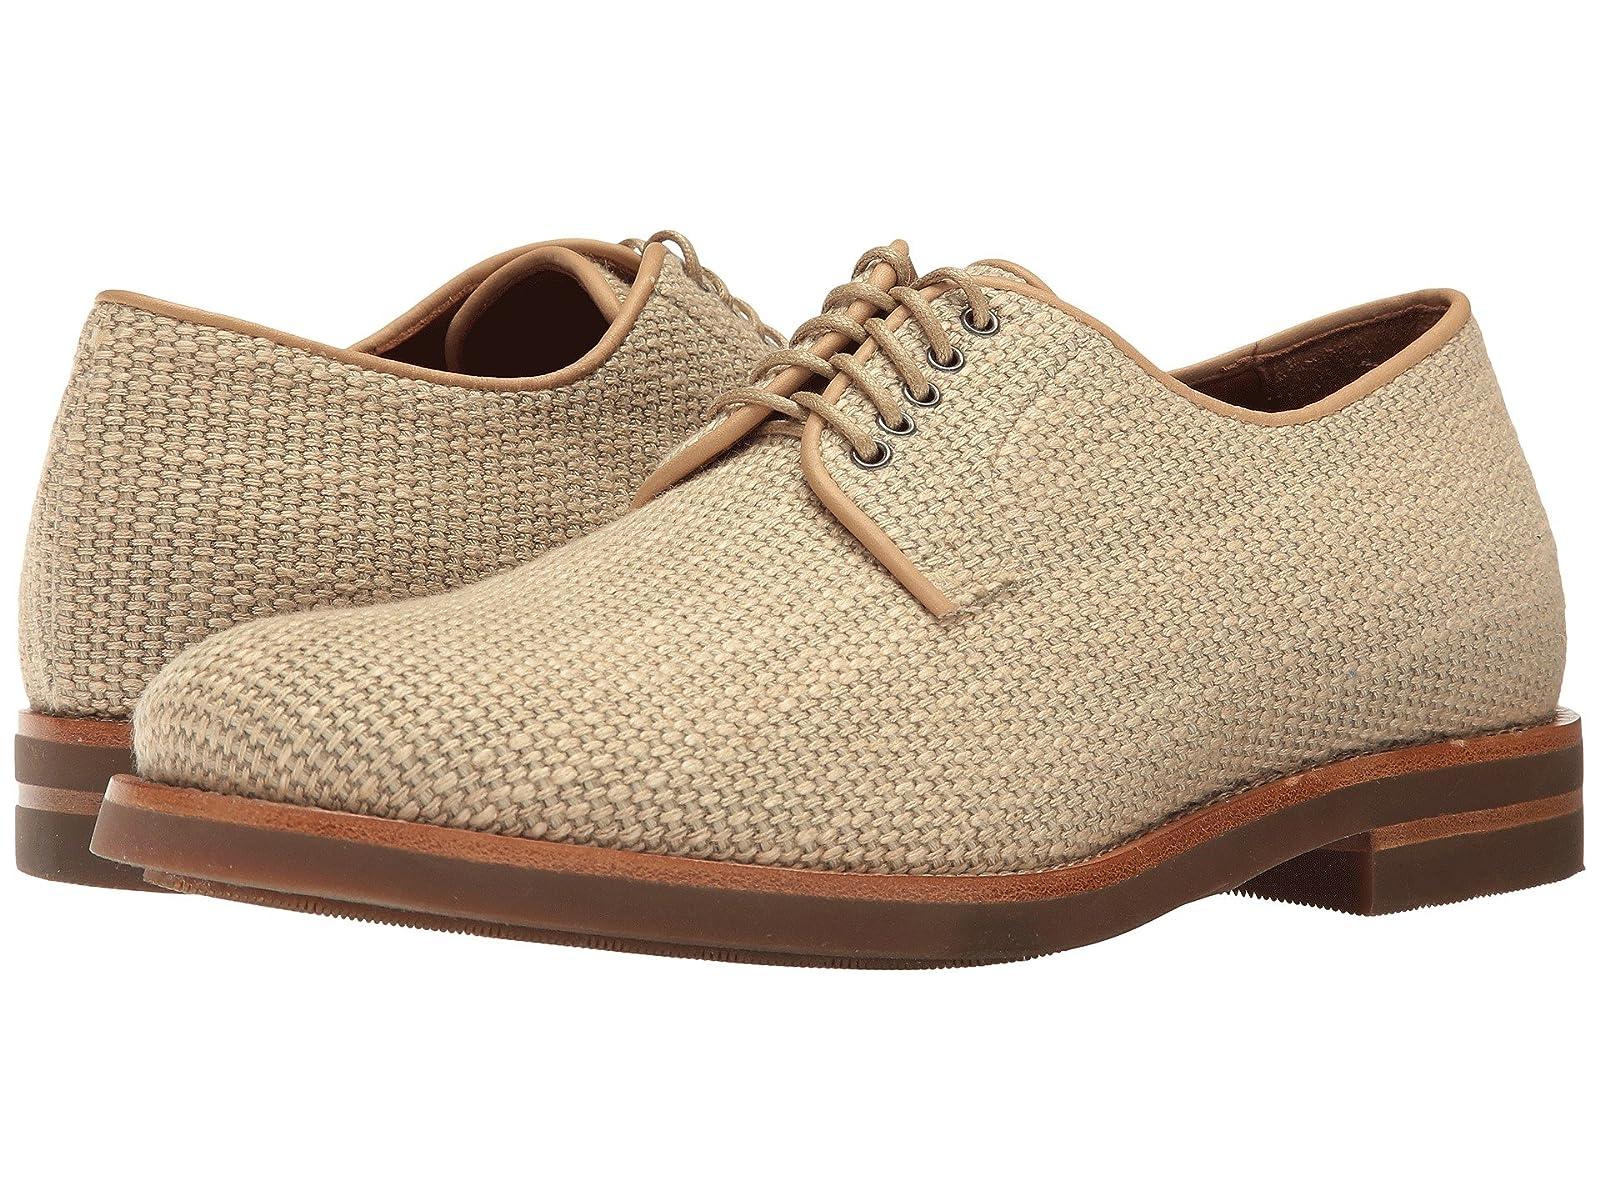 Aquatalia CollinCheap and distinctive eye-catching shoes